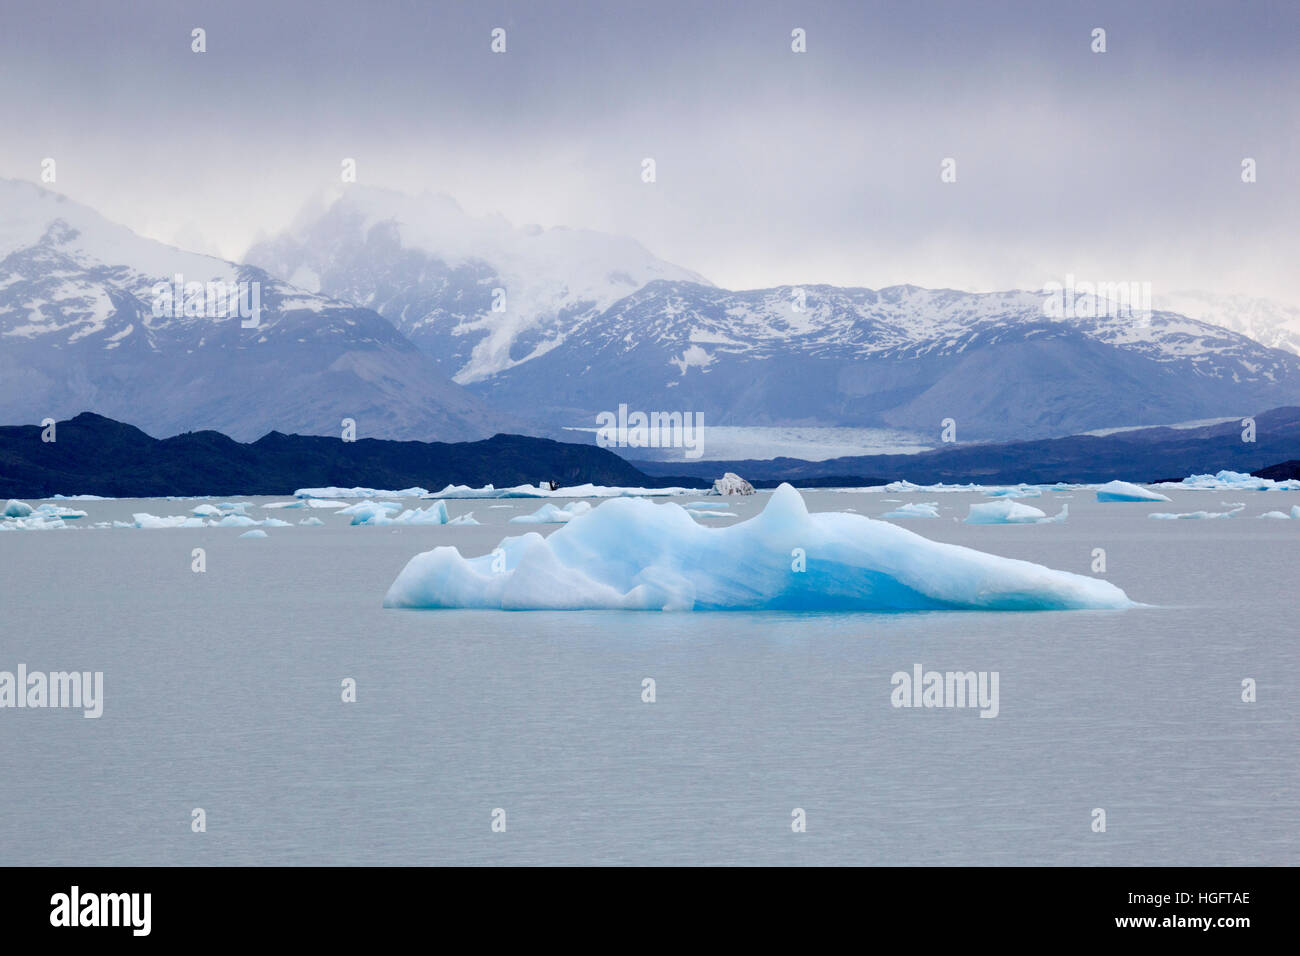 Eisberge am Lago Argentino, El Calafate, Parque Nacional Los Glaciares, Patagonien, Argentinien, Südamerika Stockbild